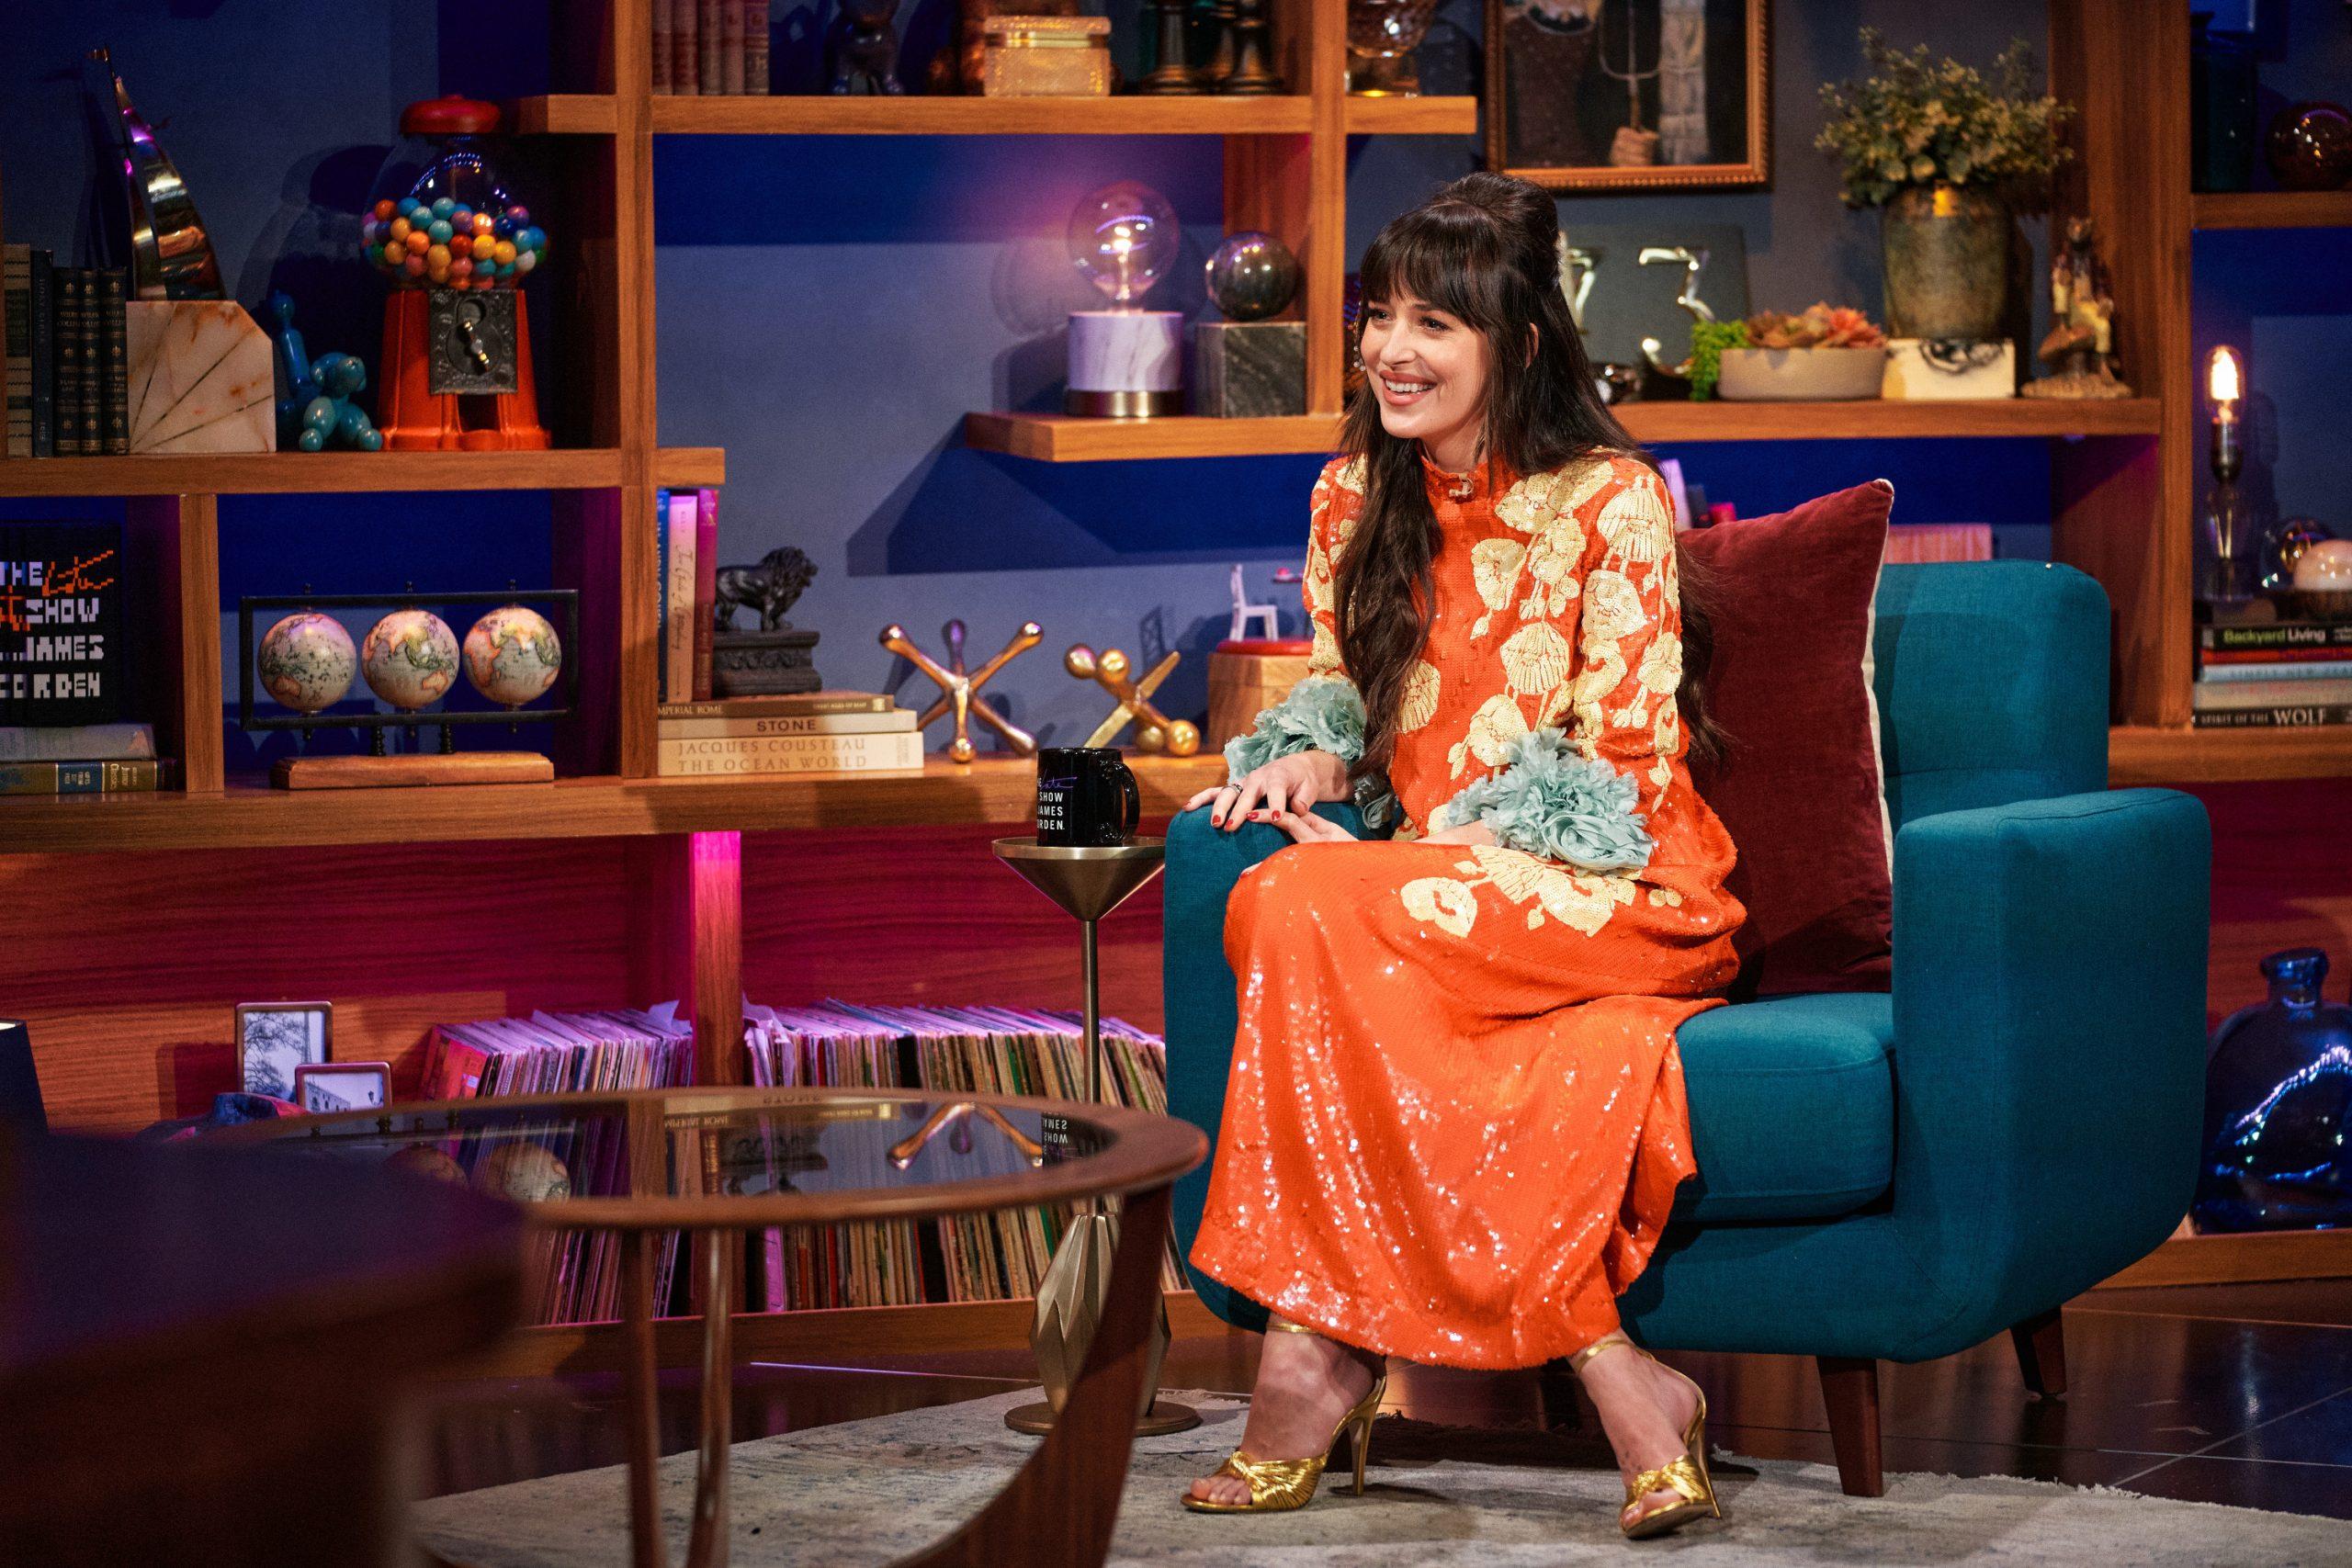 Dakota Johnson on 'The Late Late Show with James Corden' on Jan. 20, 2021.